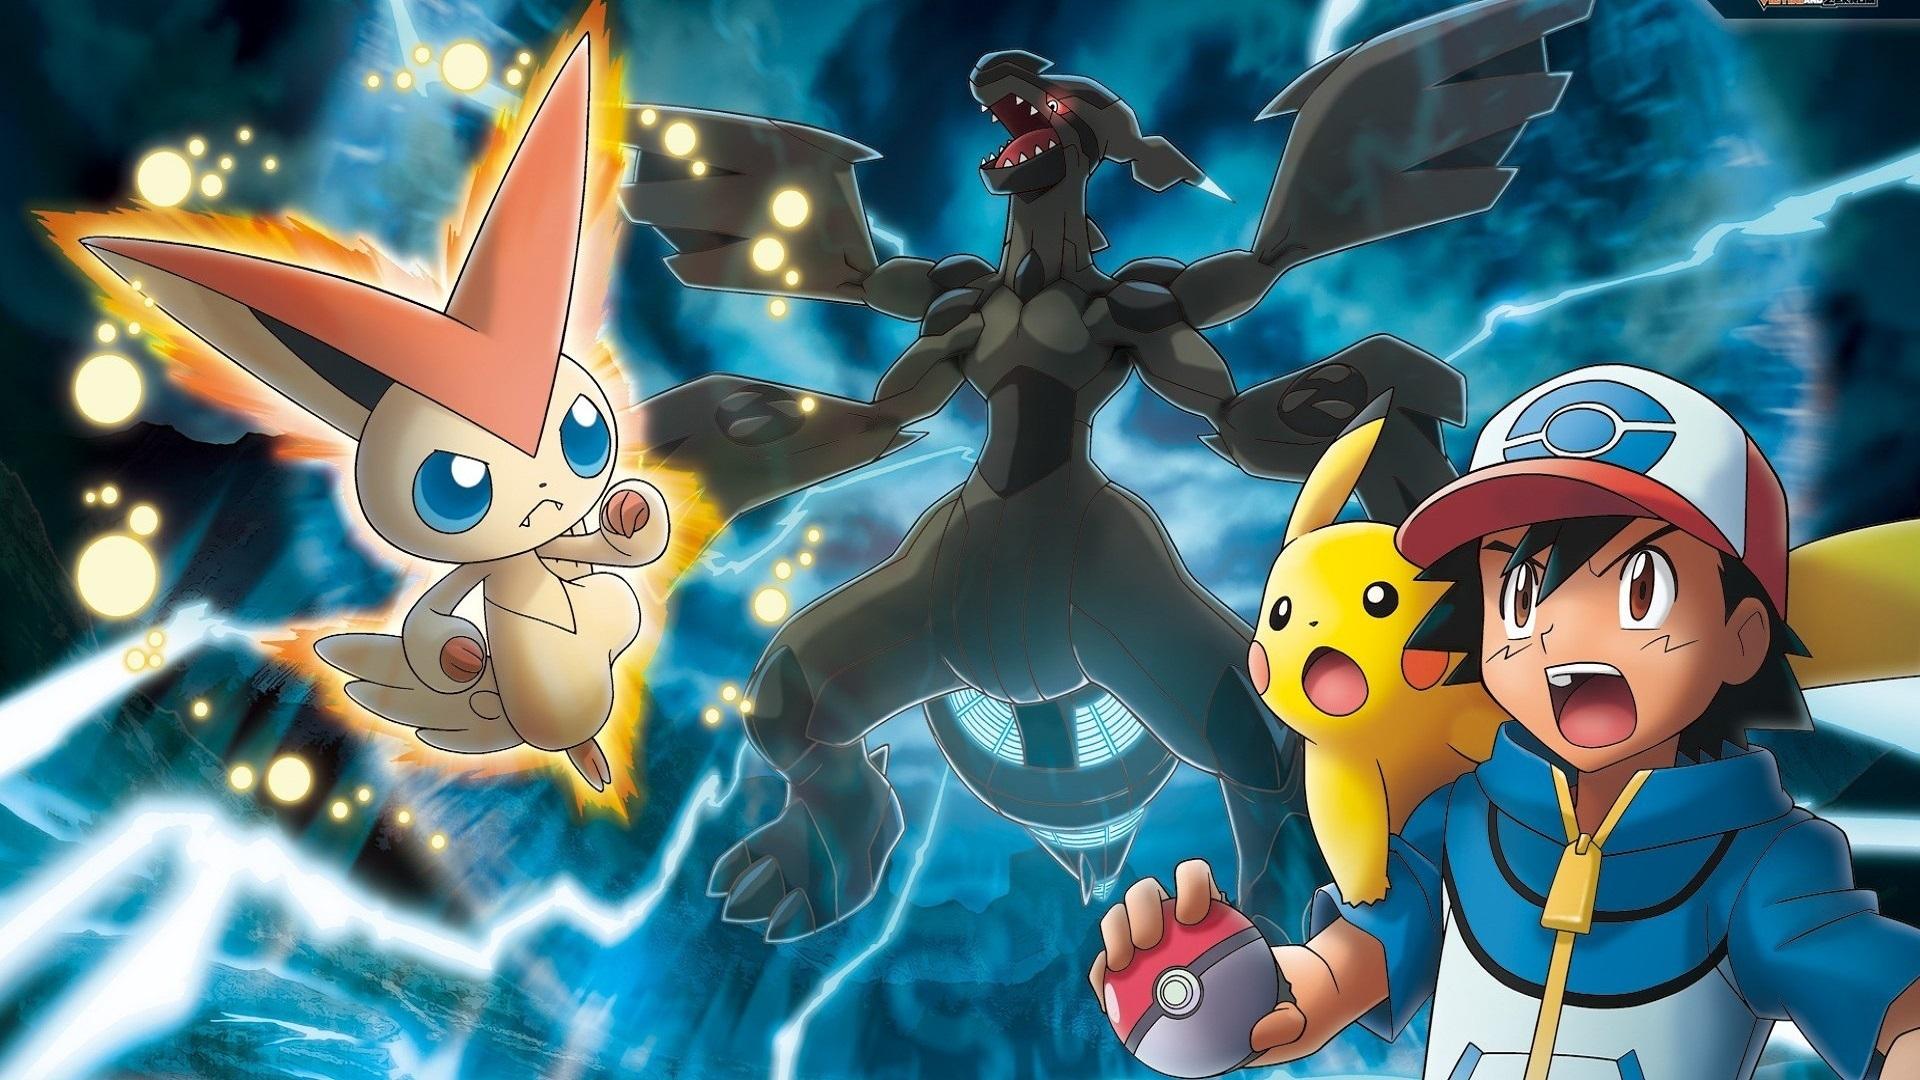 Pokémon Fond d'écran HD | Arrière-Plan | 1920x1080 | ID:675513 - Wallpaper Abyss